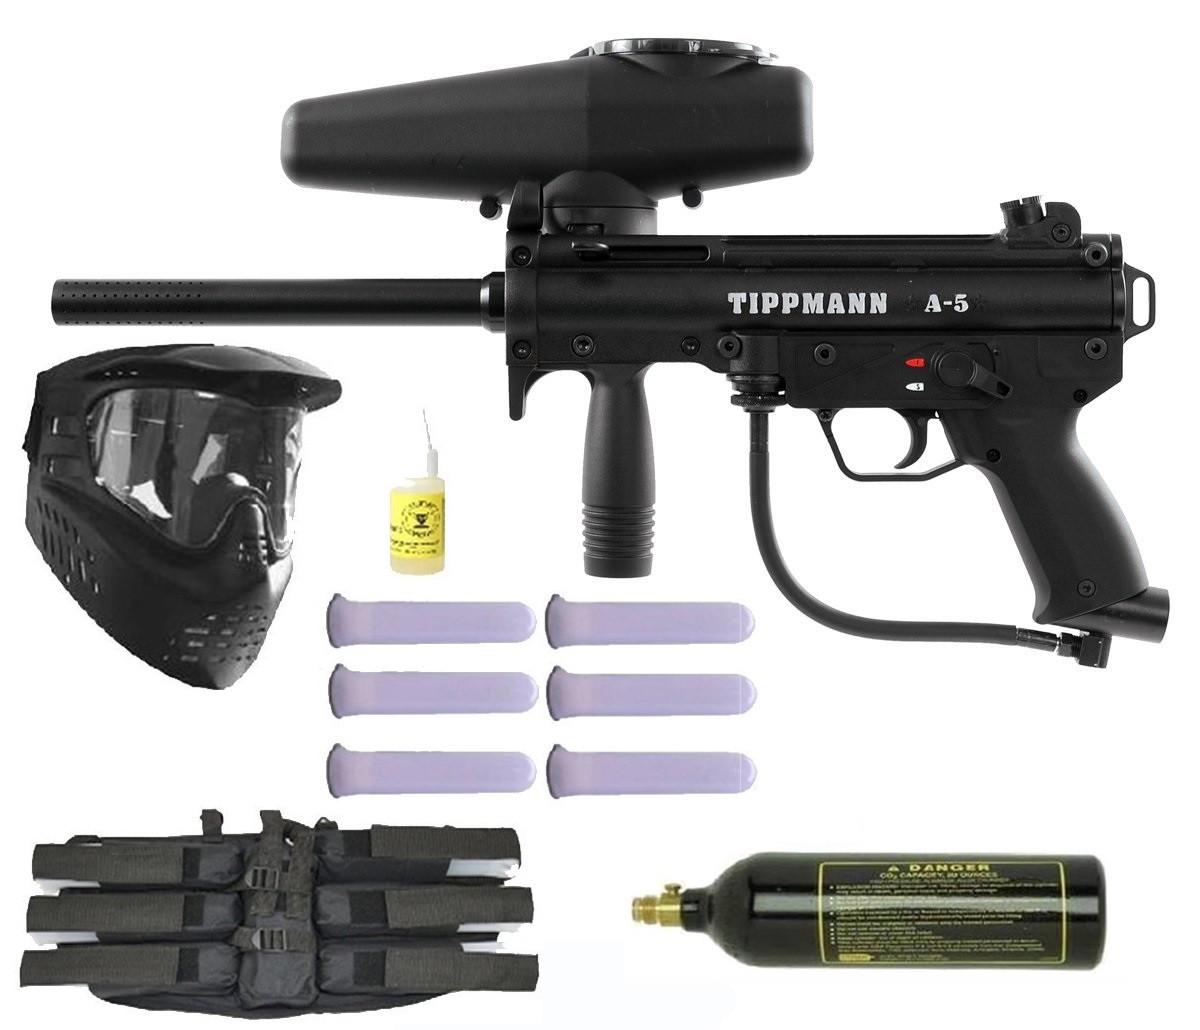 Tippmann Paintball Gun Part Diagram 35 Wiring Images X7 Phenom Mechanical V131129 01 48105142135587912801280c2 A 5 Mega Set